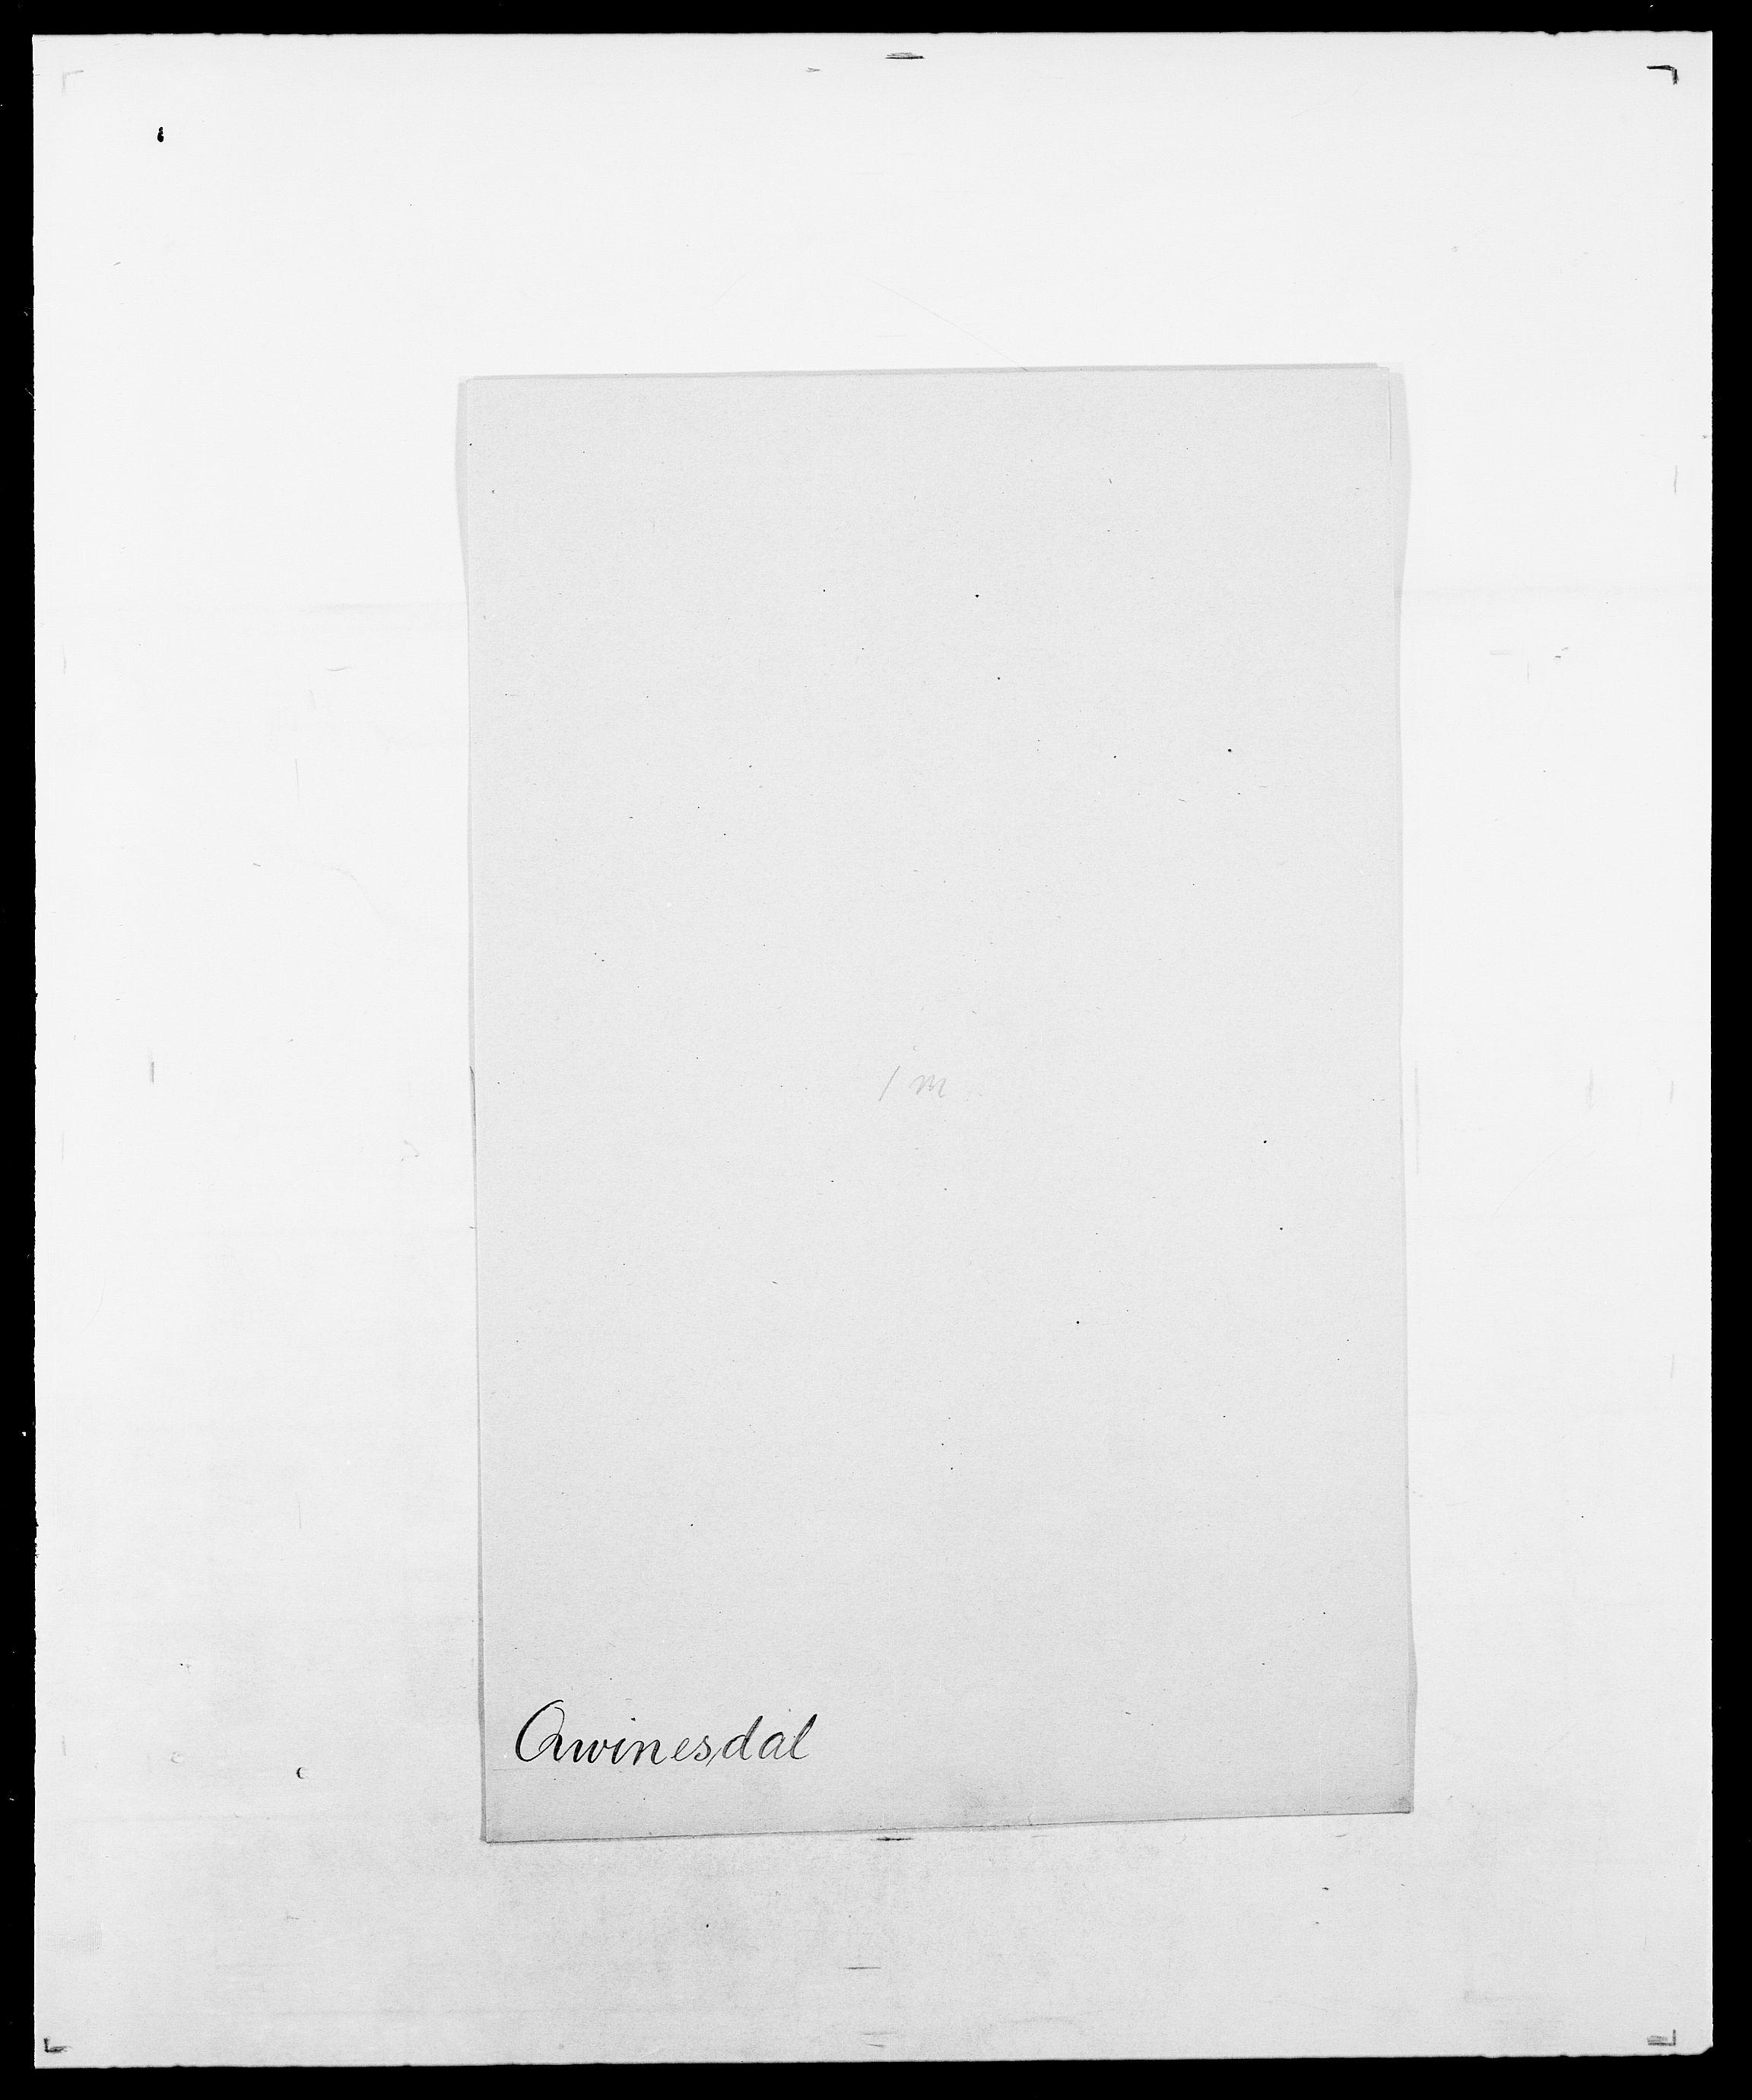 SAO, Delgobe, Charles Antoine - samling, D/Da/L0031: de Place - Raaum, s. 521